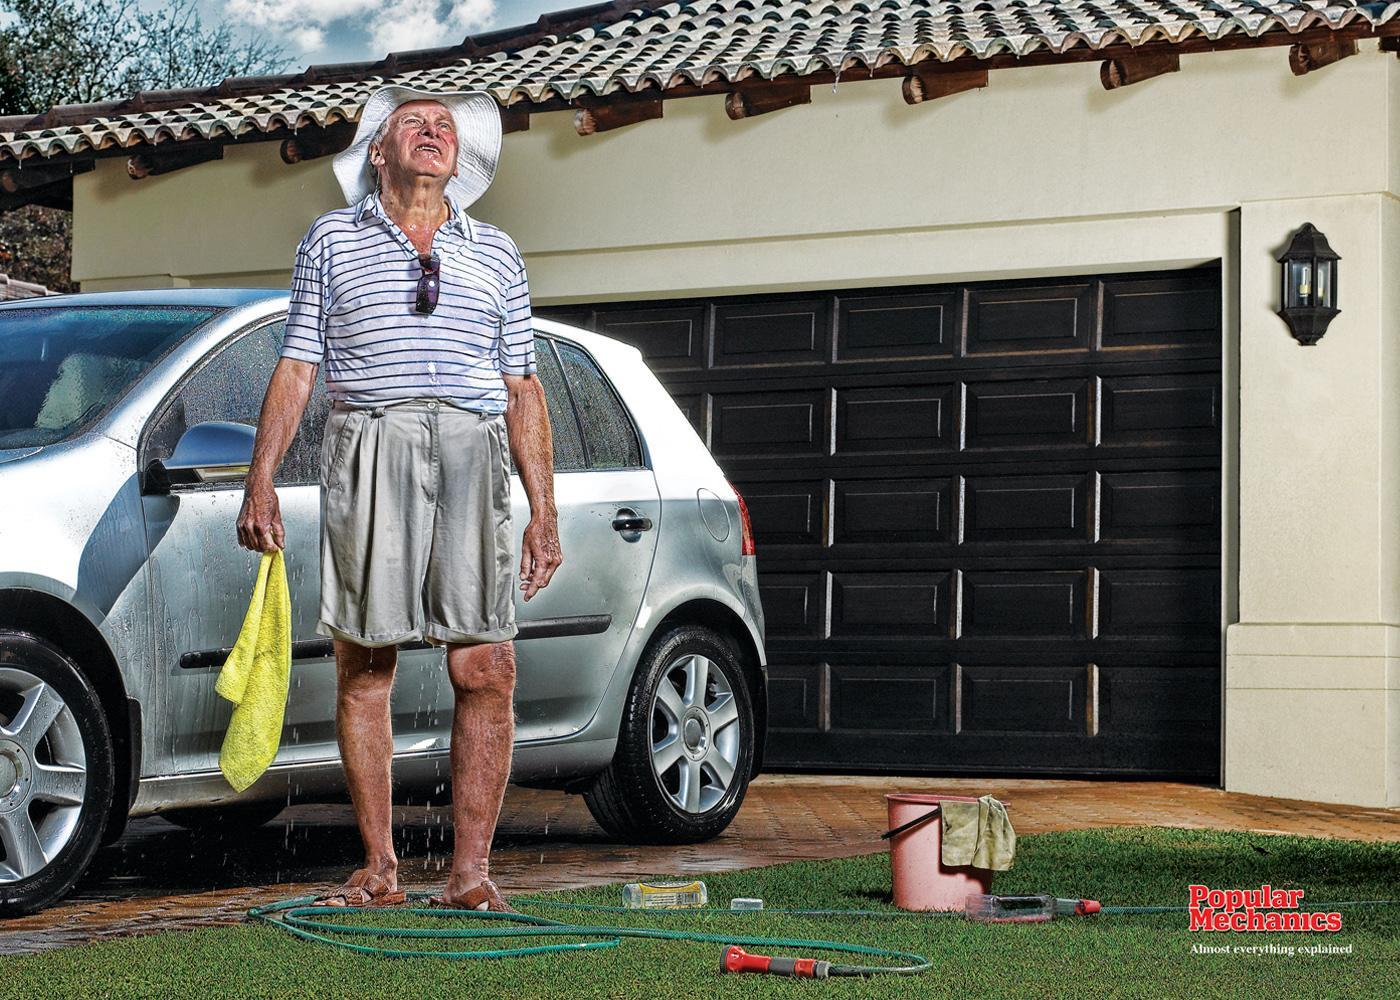 Popular Mechanics Print Ad -  Rain